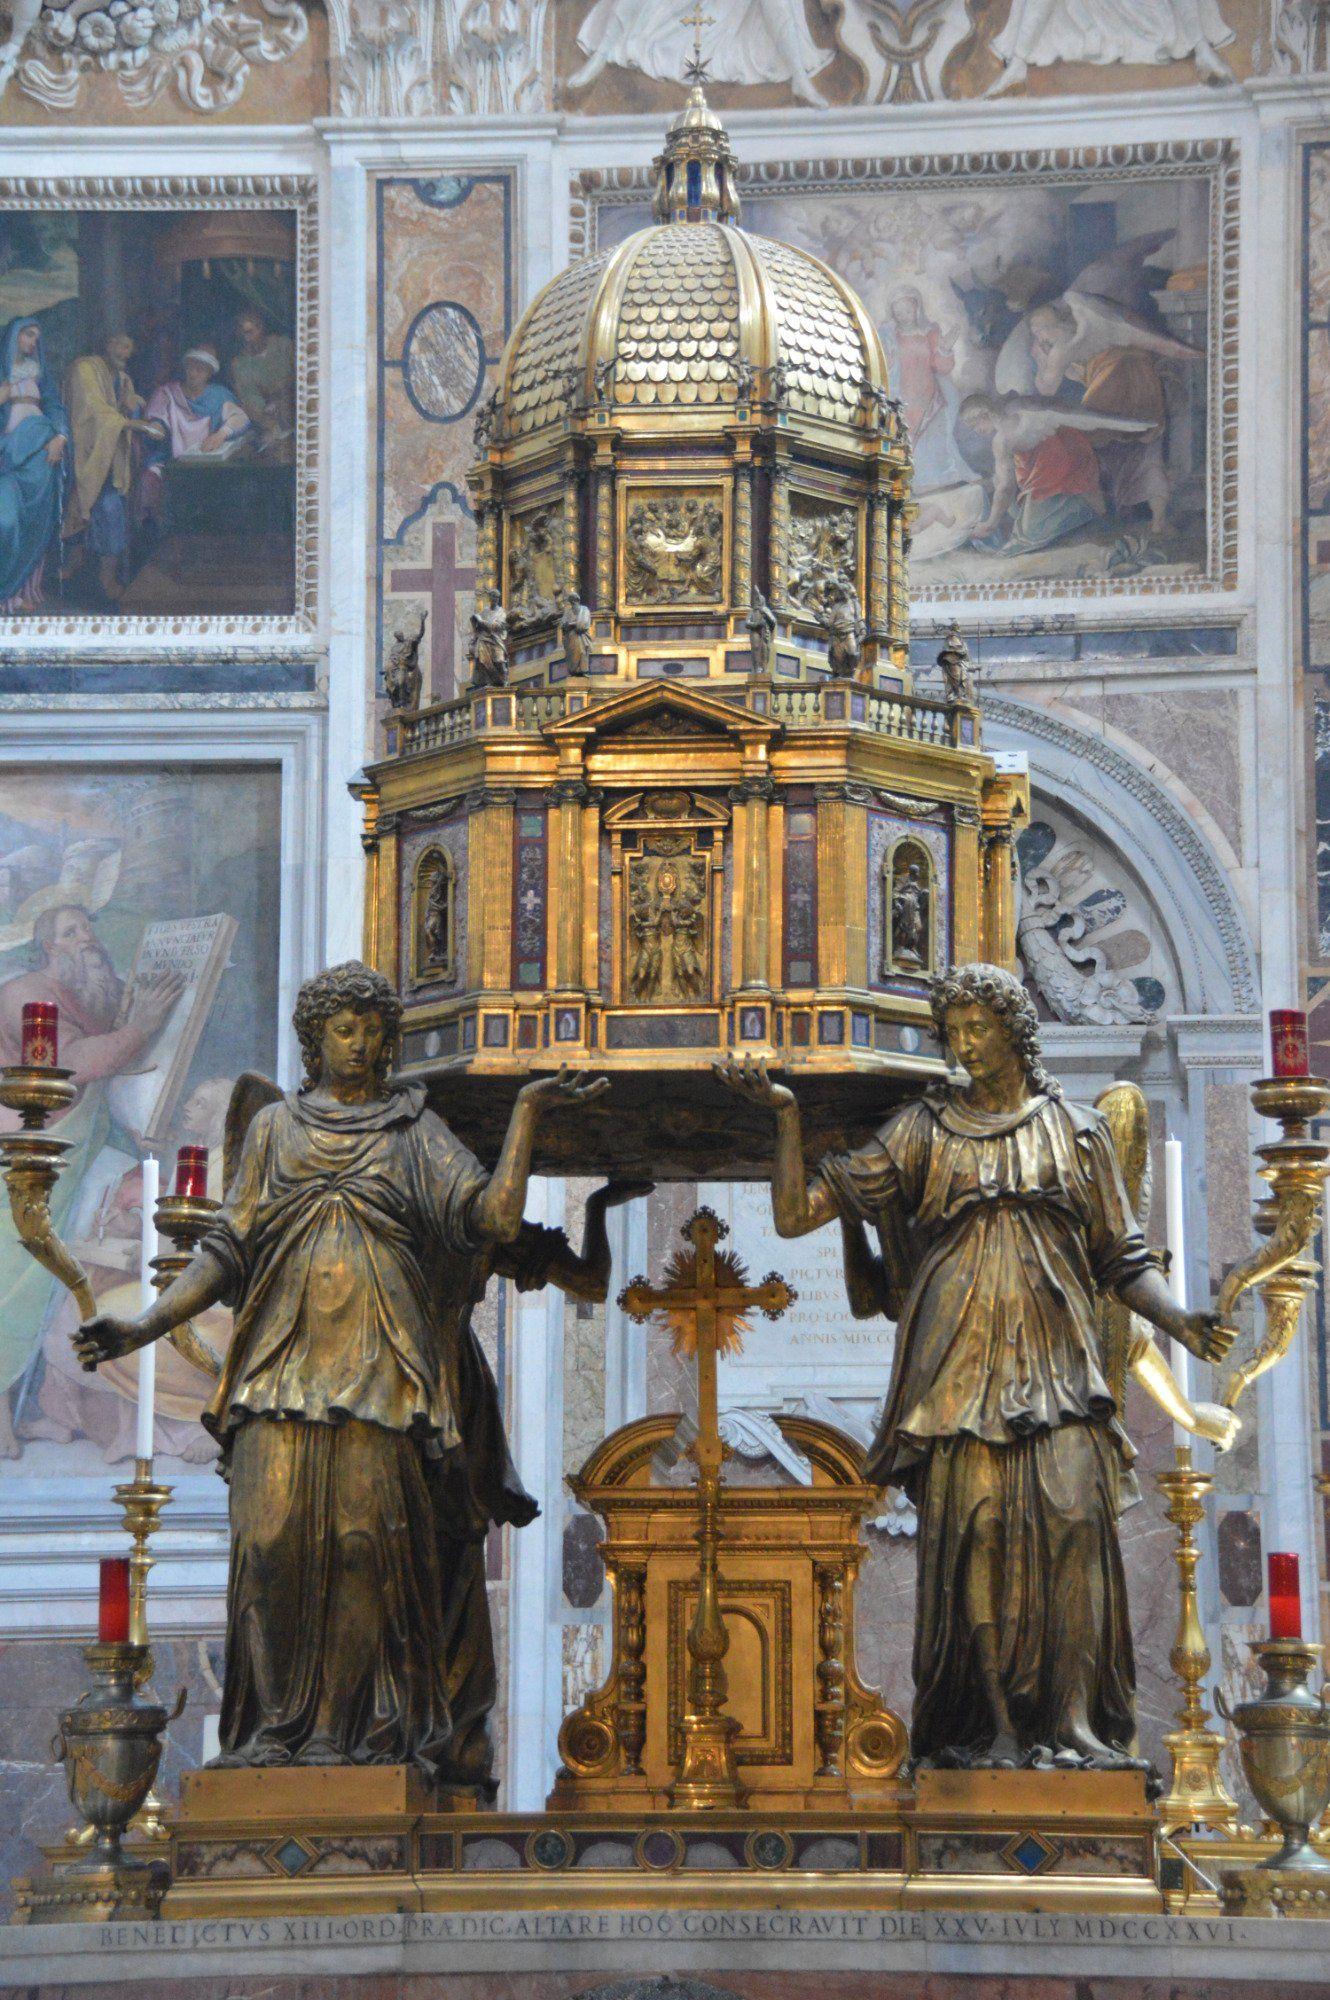 Santa Maria Maggiore (Piazza dell' Esquilino), Rome, Italy (y)